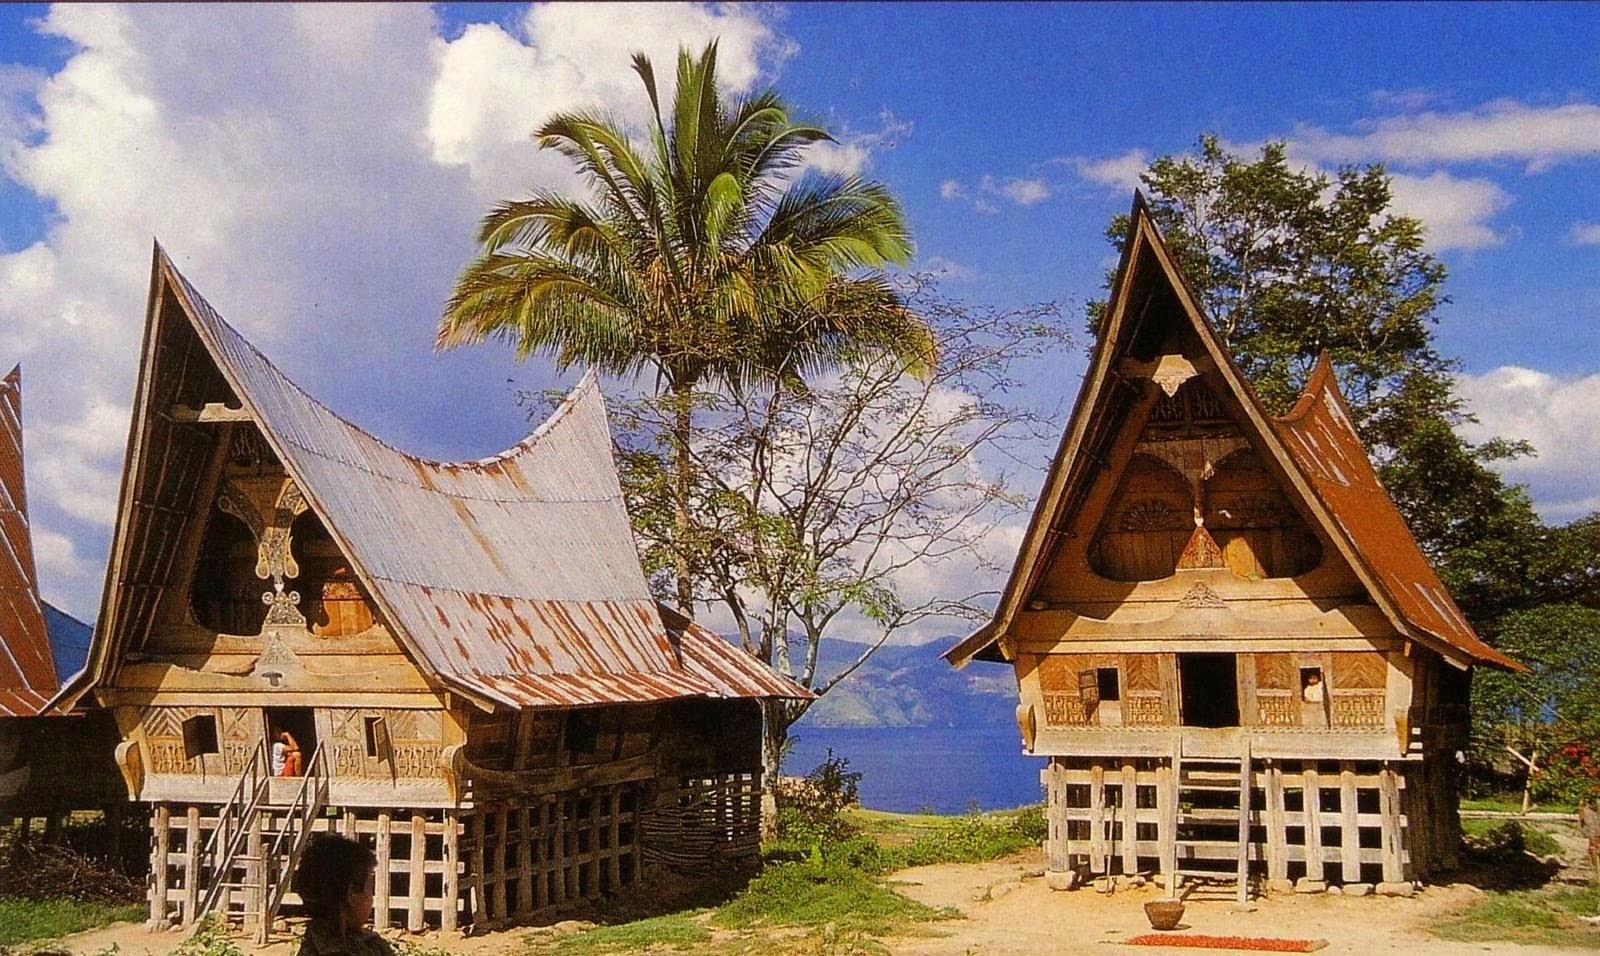 Kumpulan Gambar Rumah Adat Di Indonesia Info Gambar